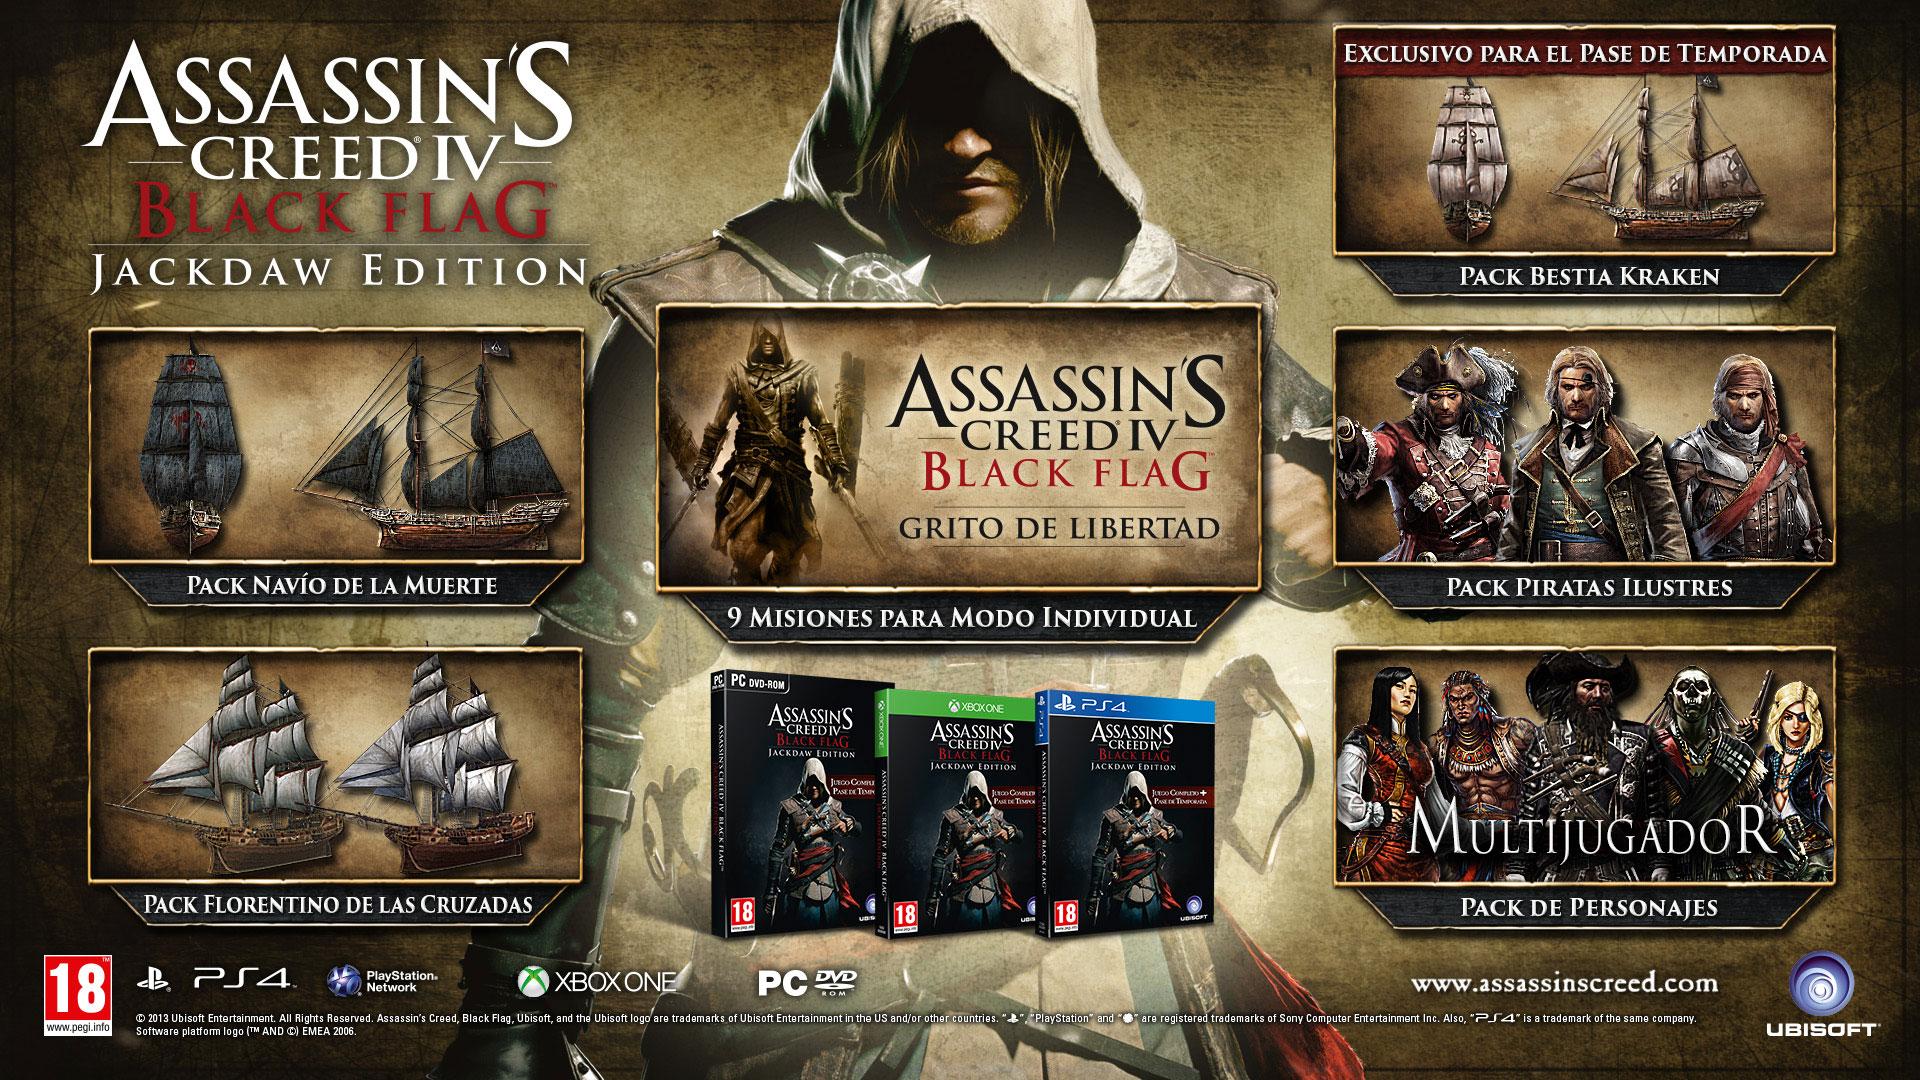 Jackdaw Edition de Assassin's Creed IV Black Flag